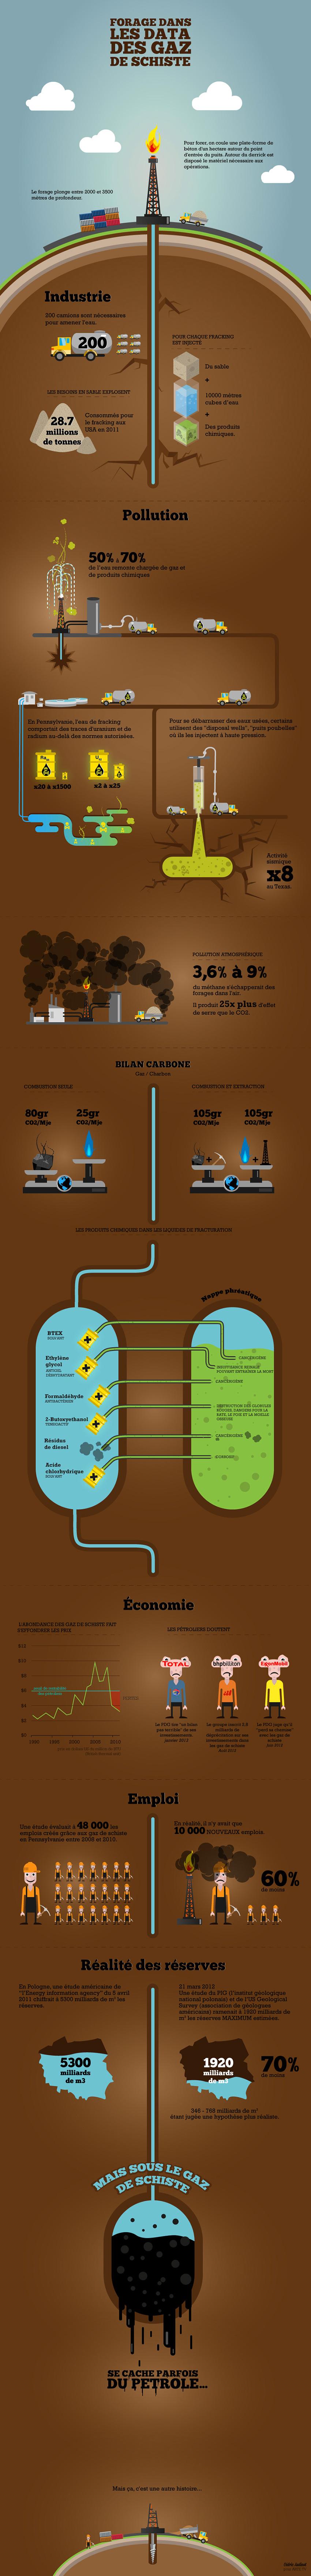 infographie-data-données-gaz-de-schiste_by_cedric_audinot